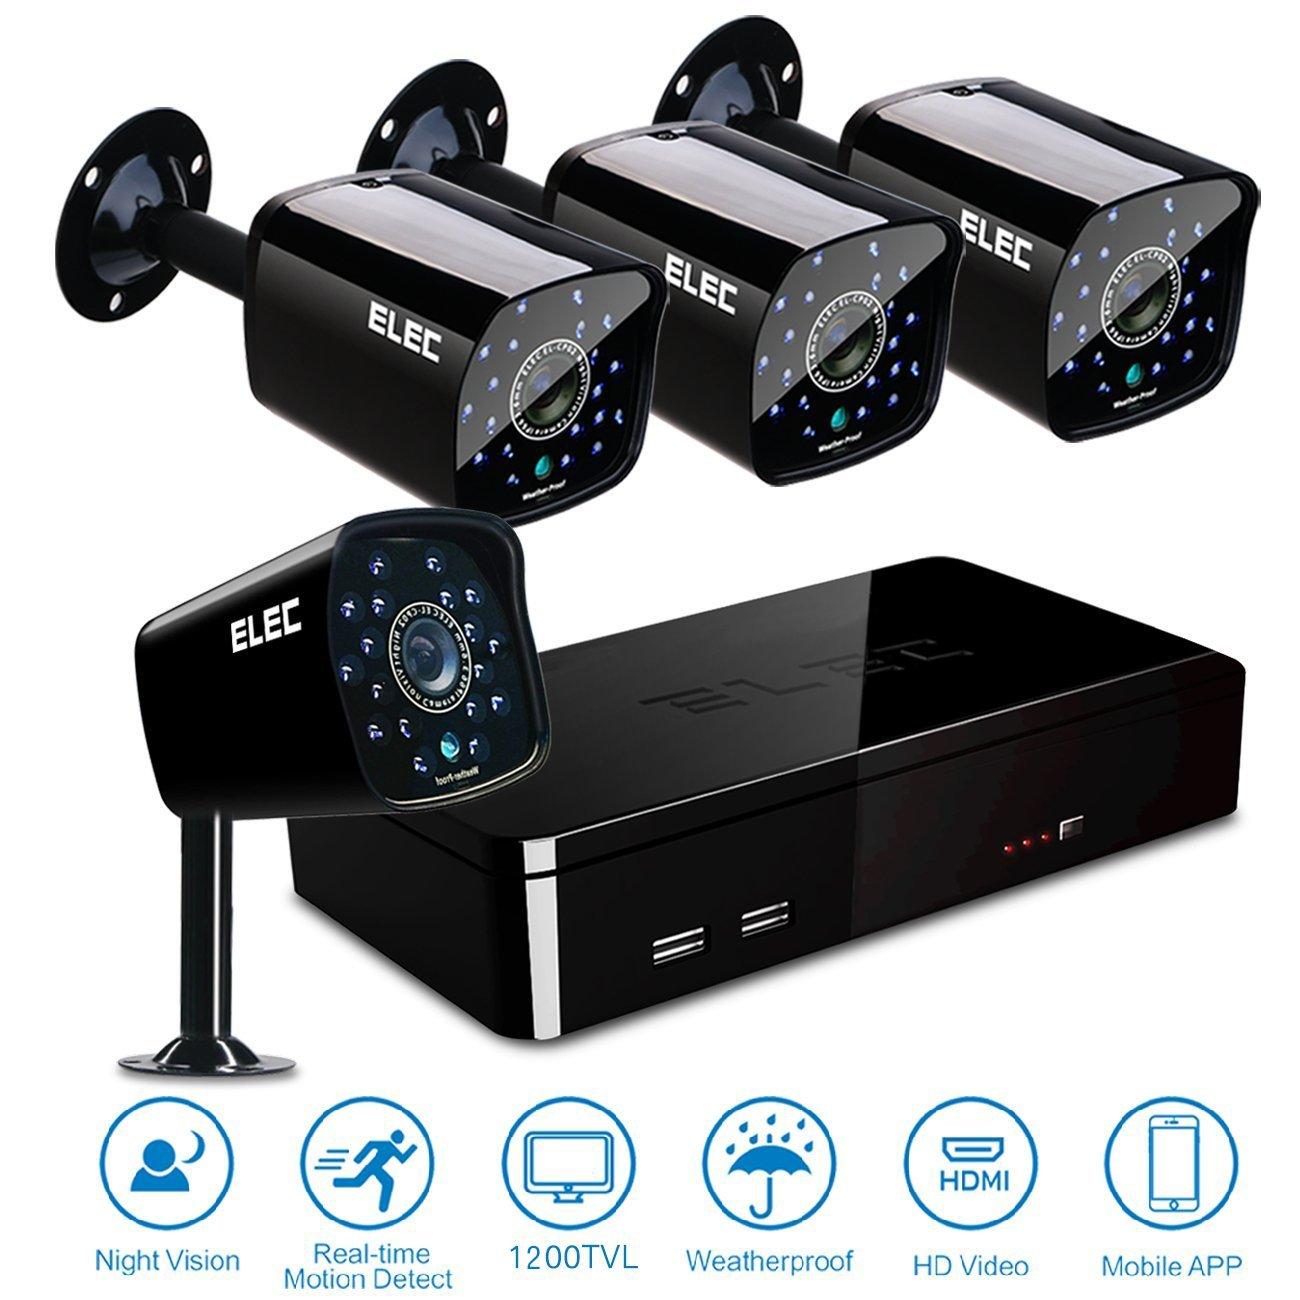 Euro Gentoo : Monitoring Camera Kind - Essential Surveillance Functions